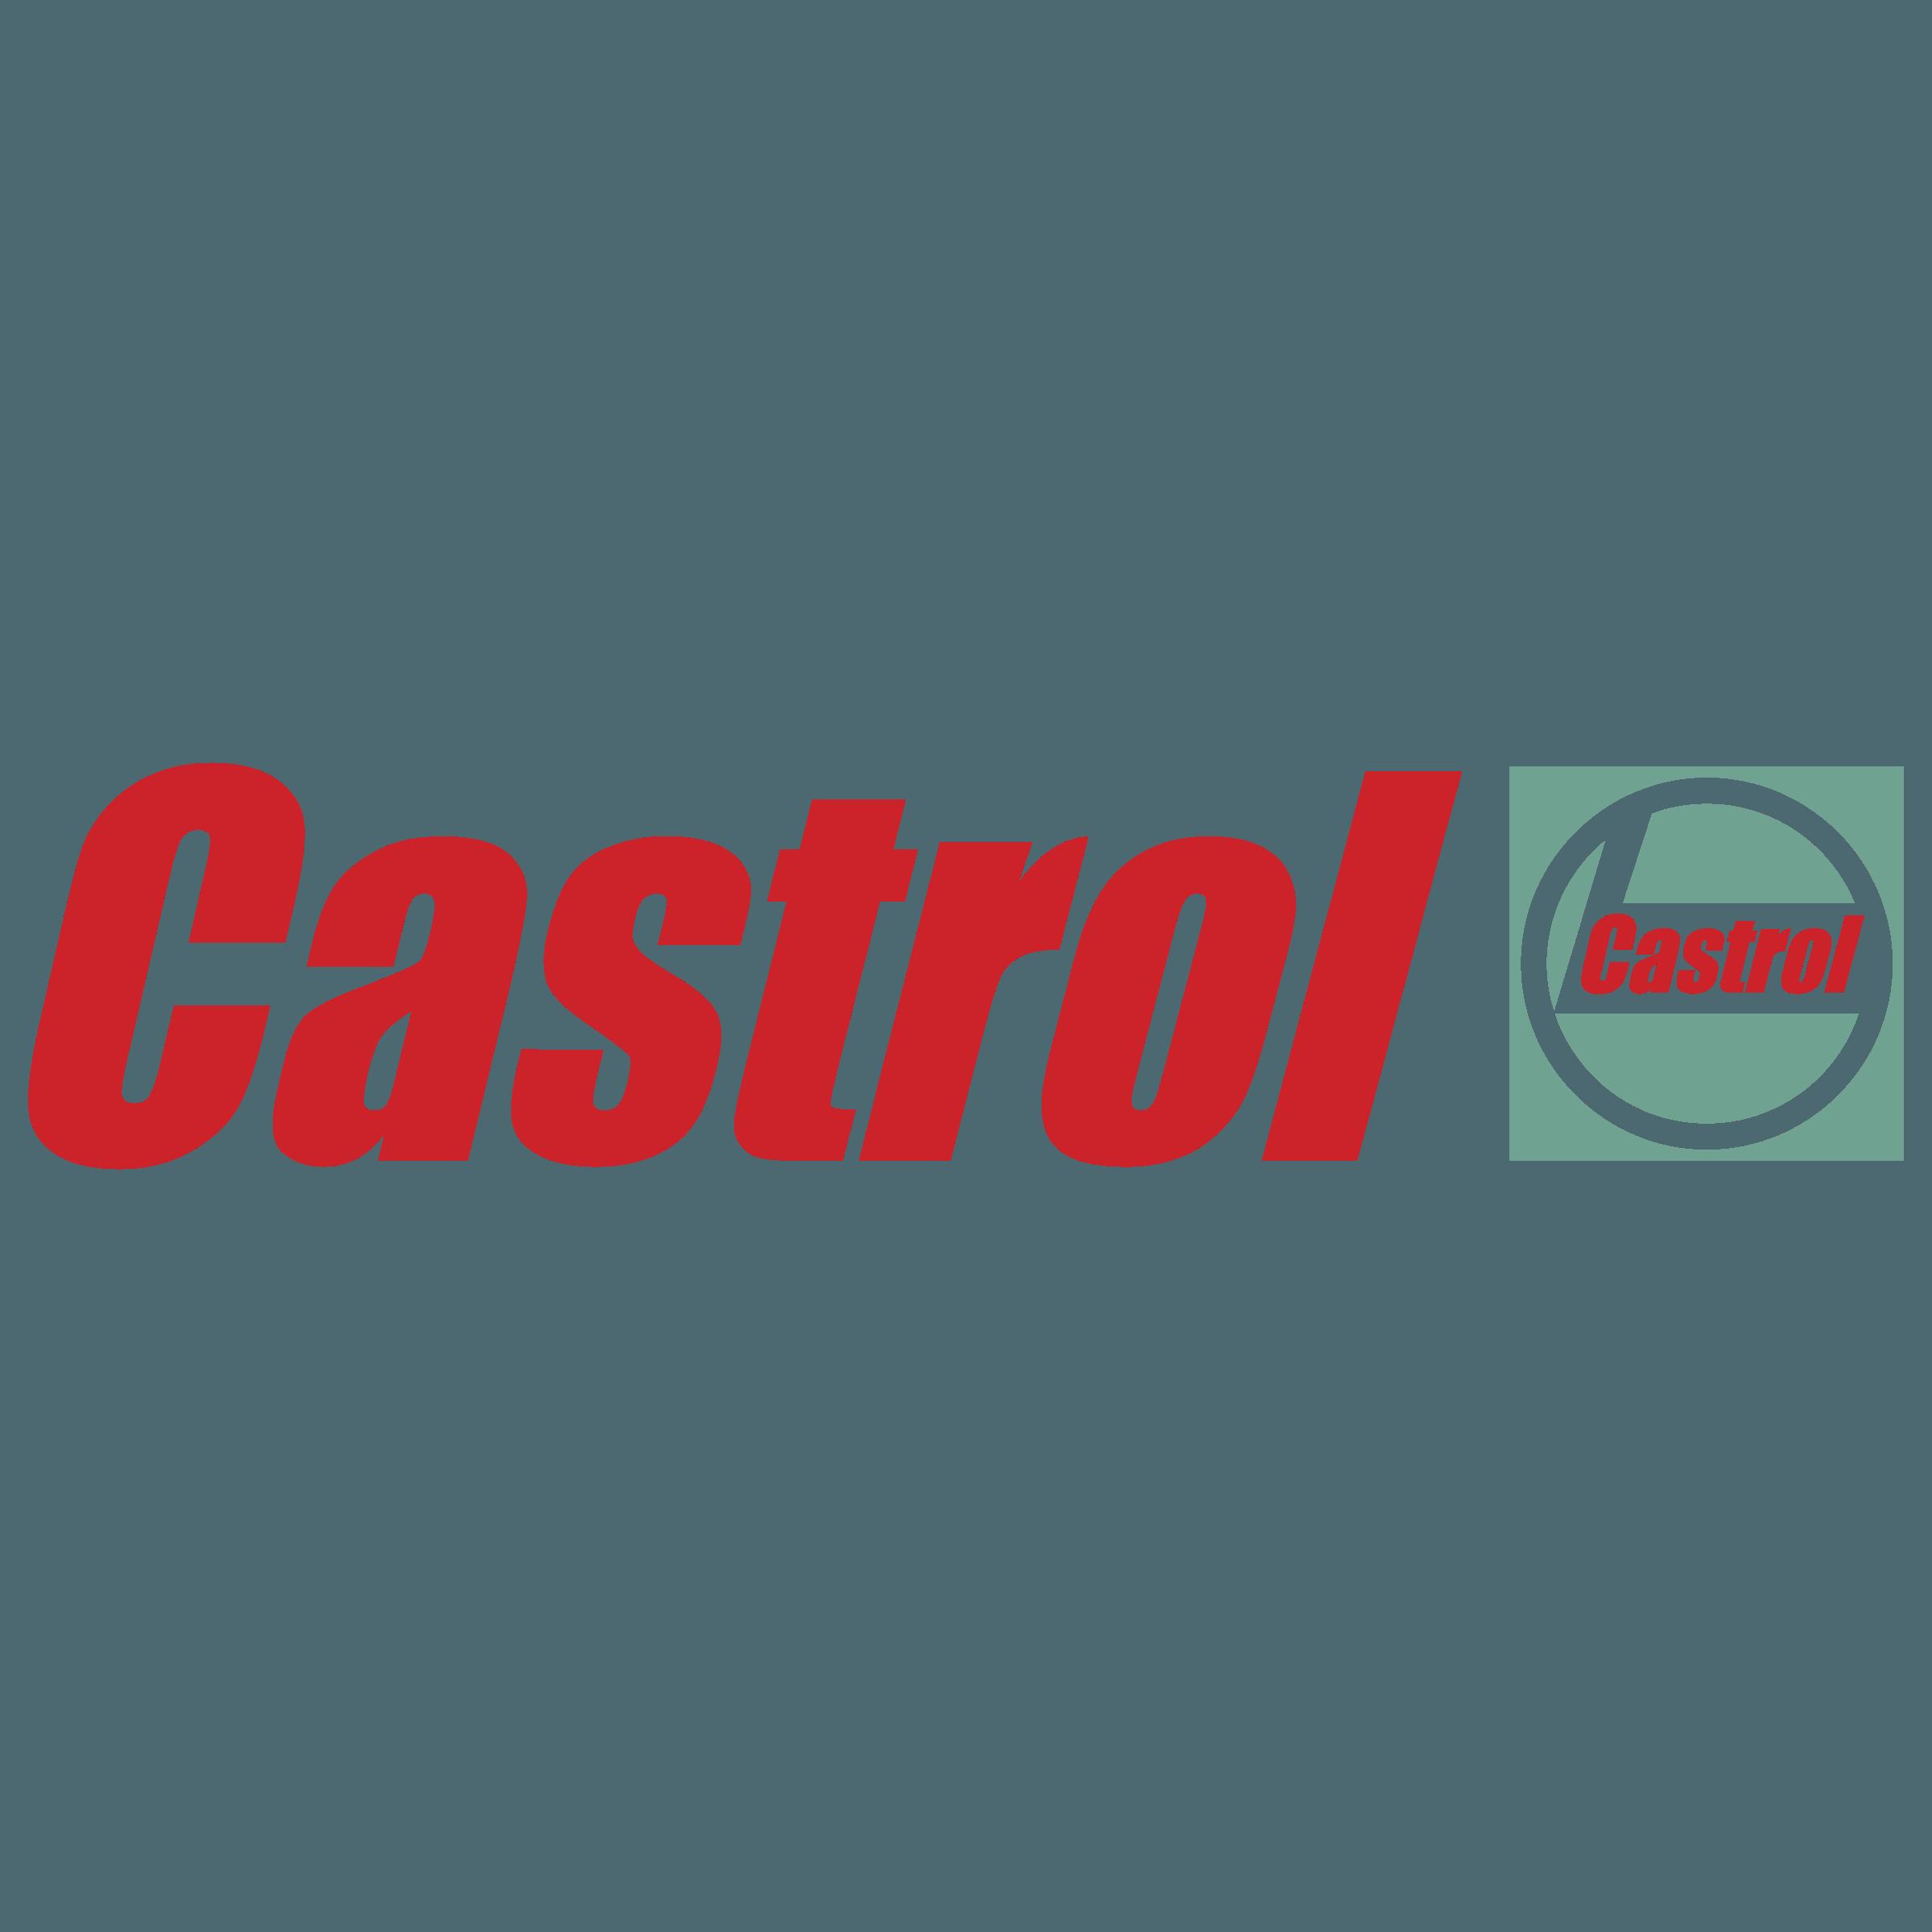 castrol png 8